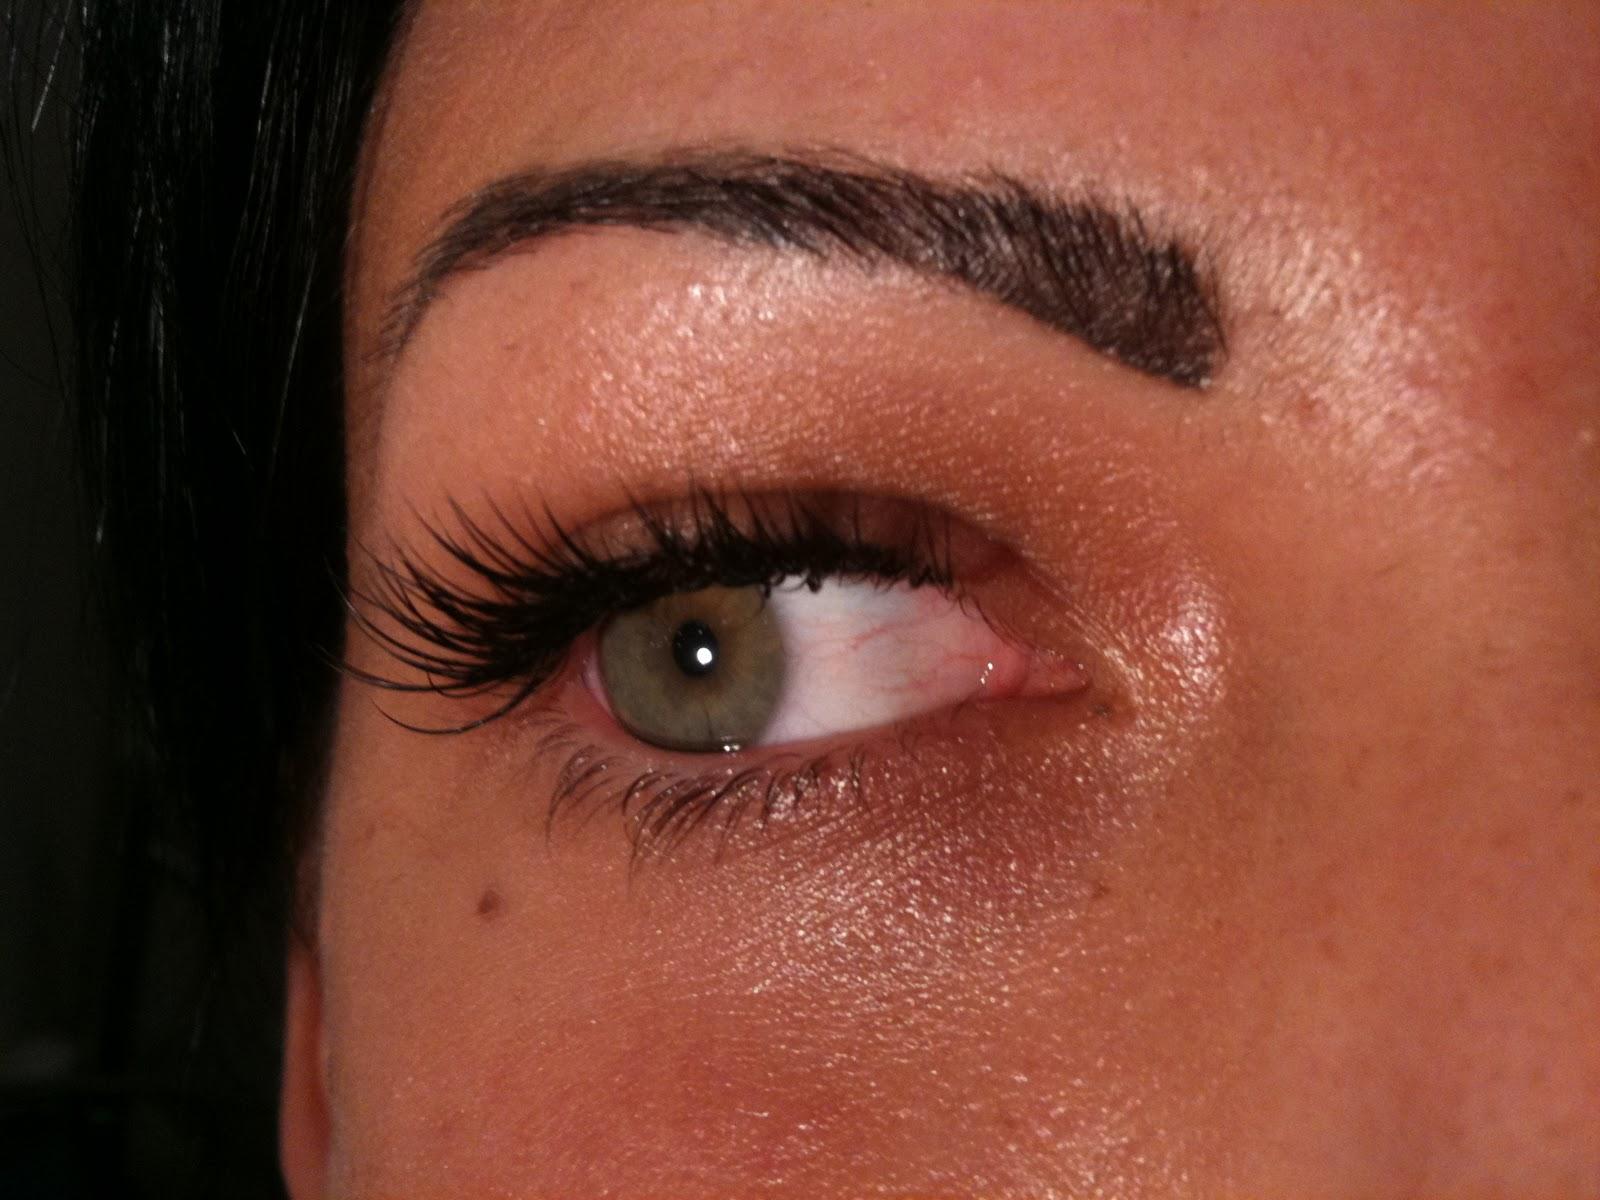 maquillage semi permanent dermopigmentation visage sourcils levres ras de cils. Black Bedroom Furniture Sets. Home Design Ideas